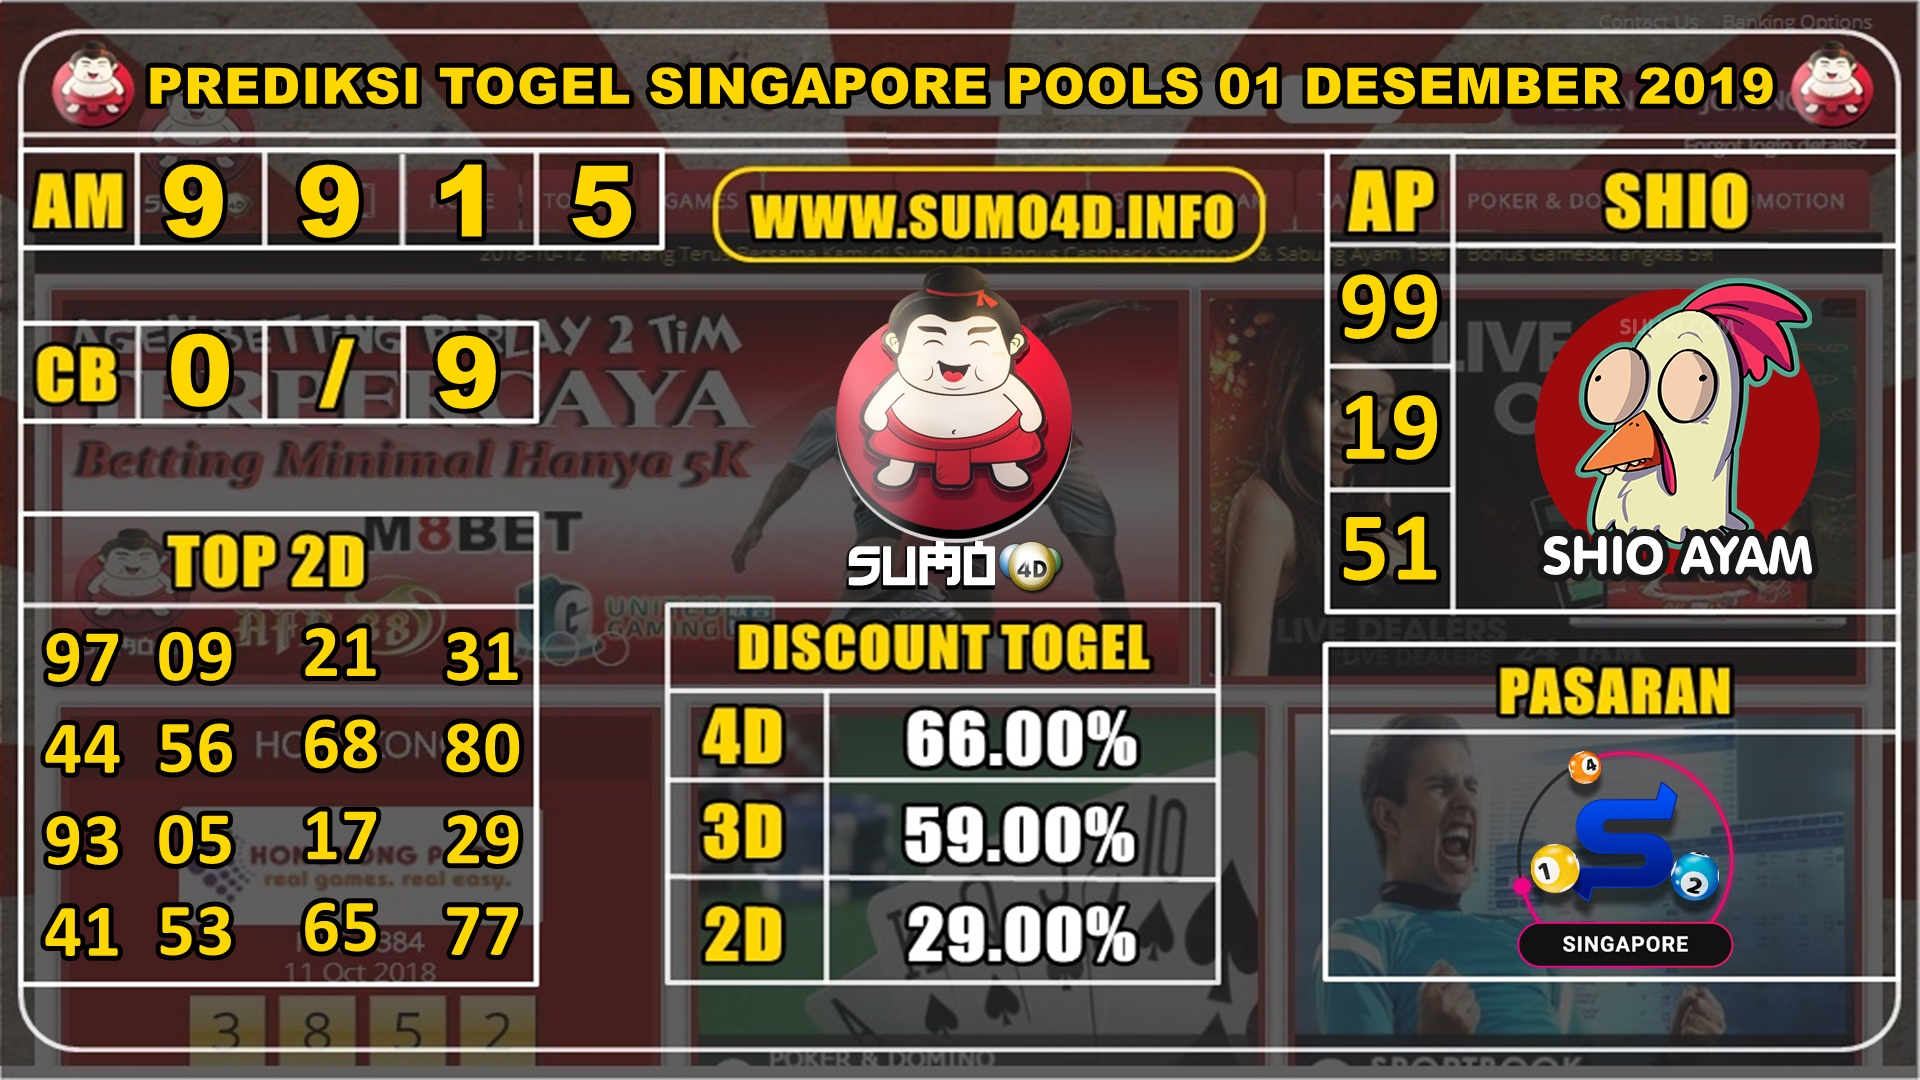 PREDIKSI TOGEL SINGAPORE POOLS 01 DESEMBER 2019